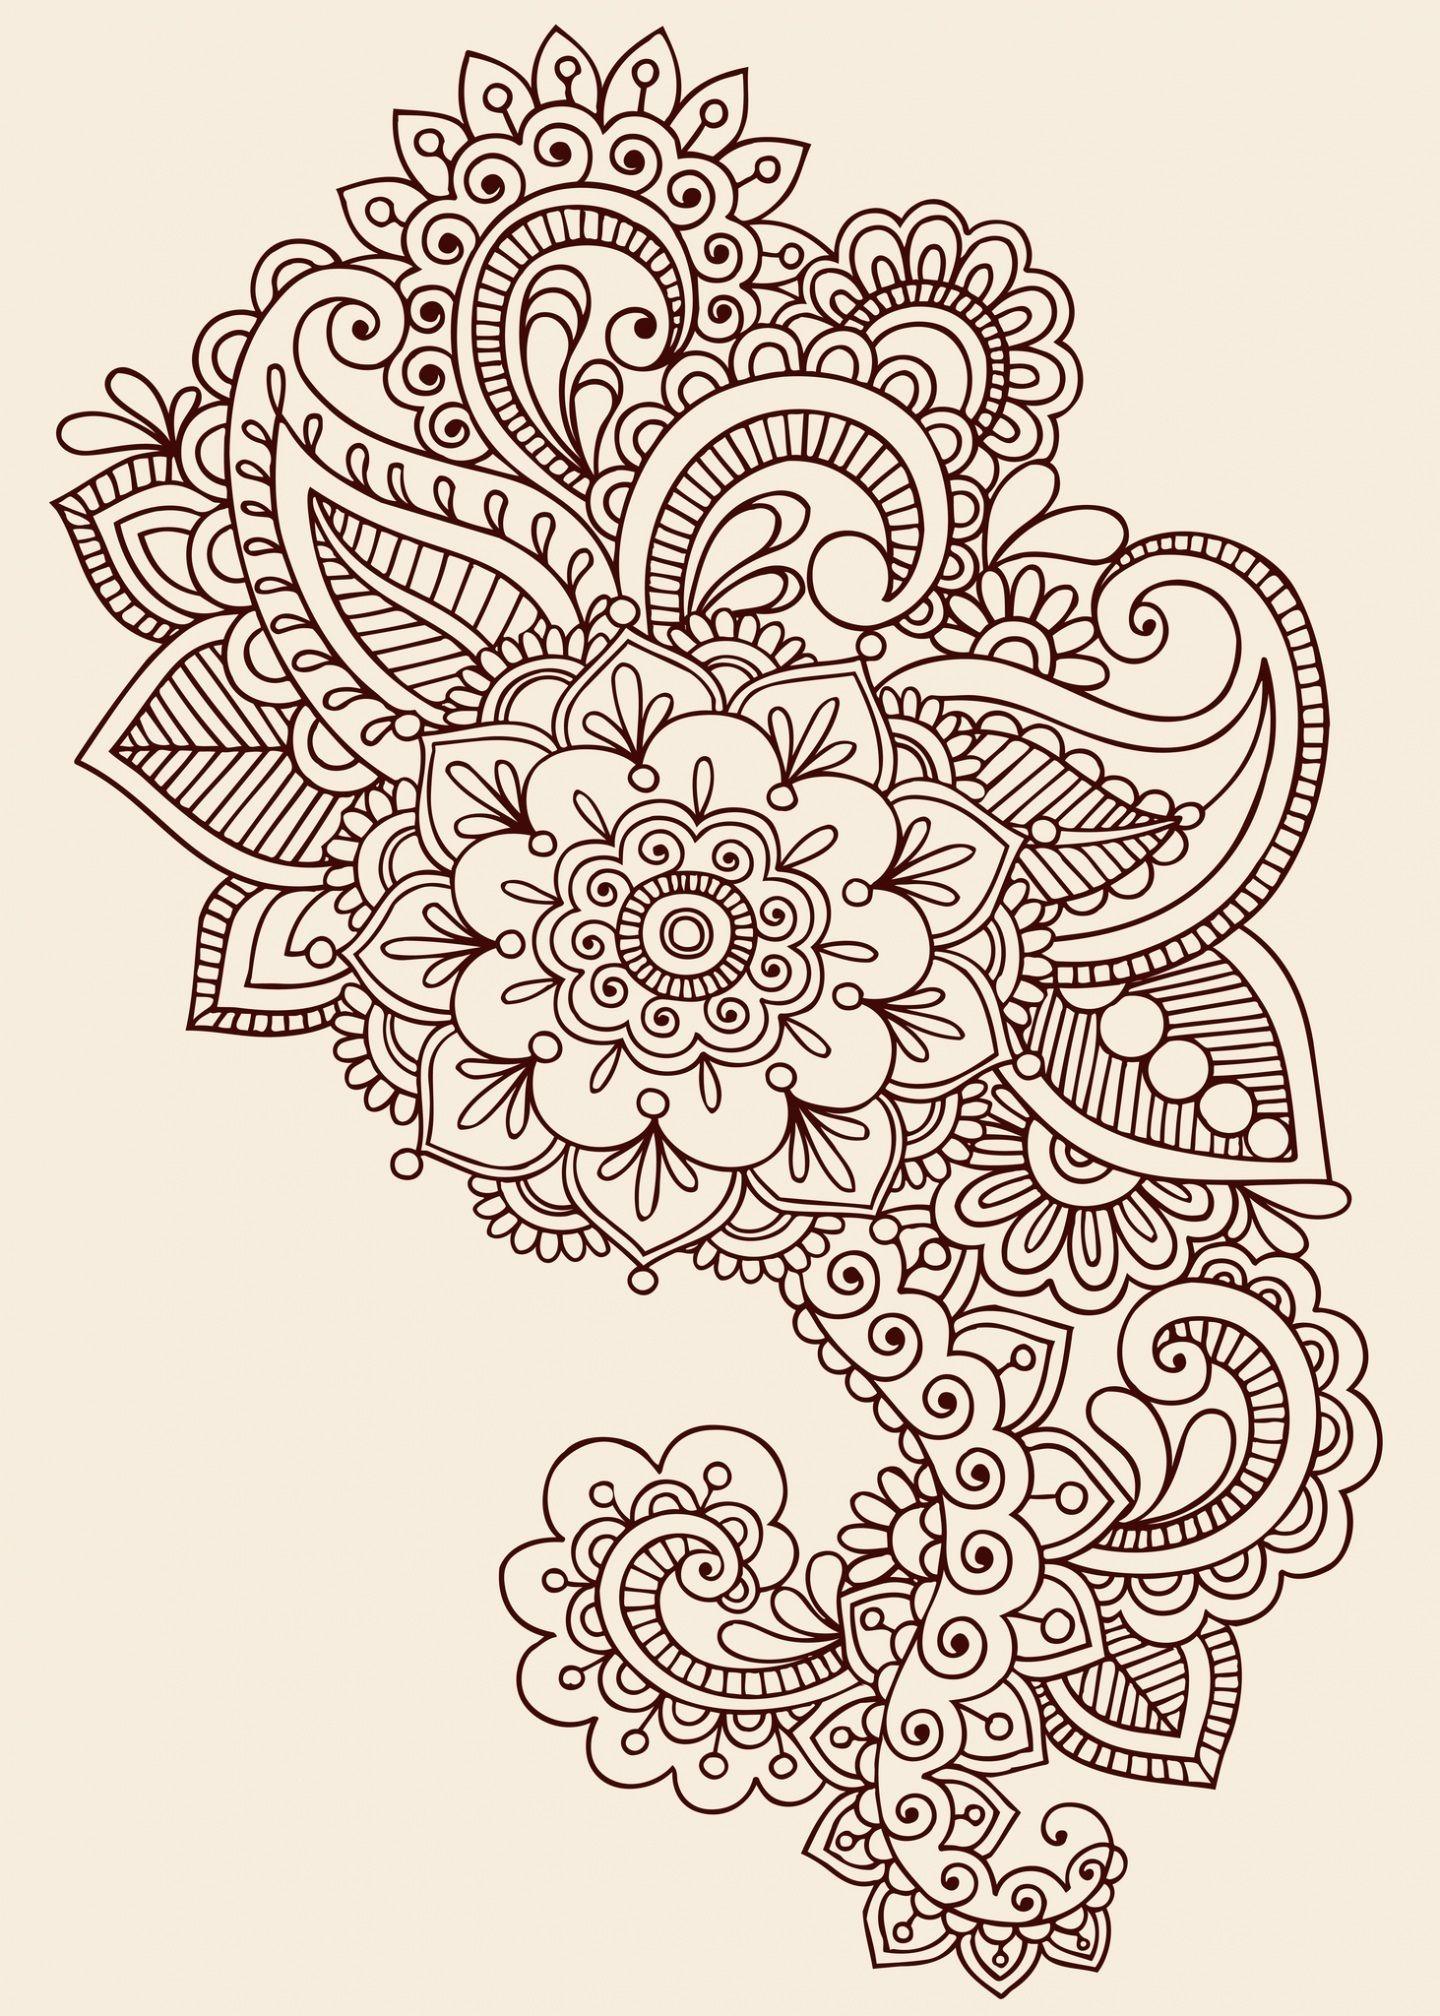 Mehndi Flower Tattoo Designs: Paisley Henna Tattoo Design Henna Flower Tattoo Designs